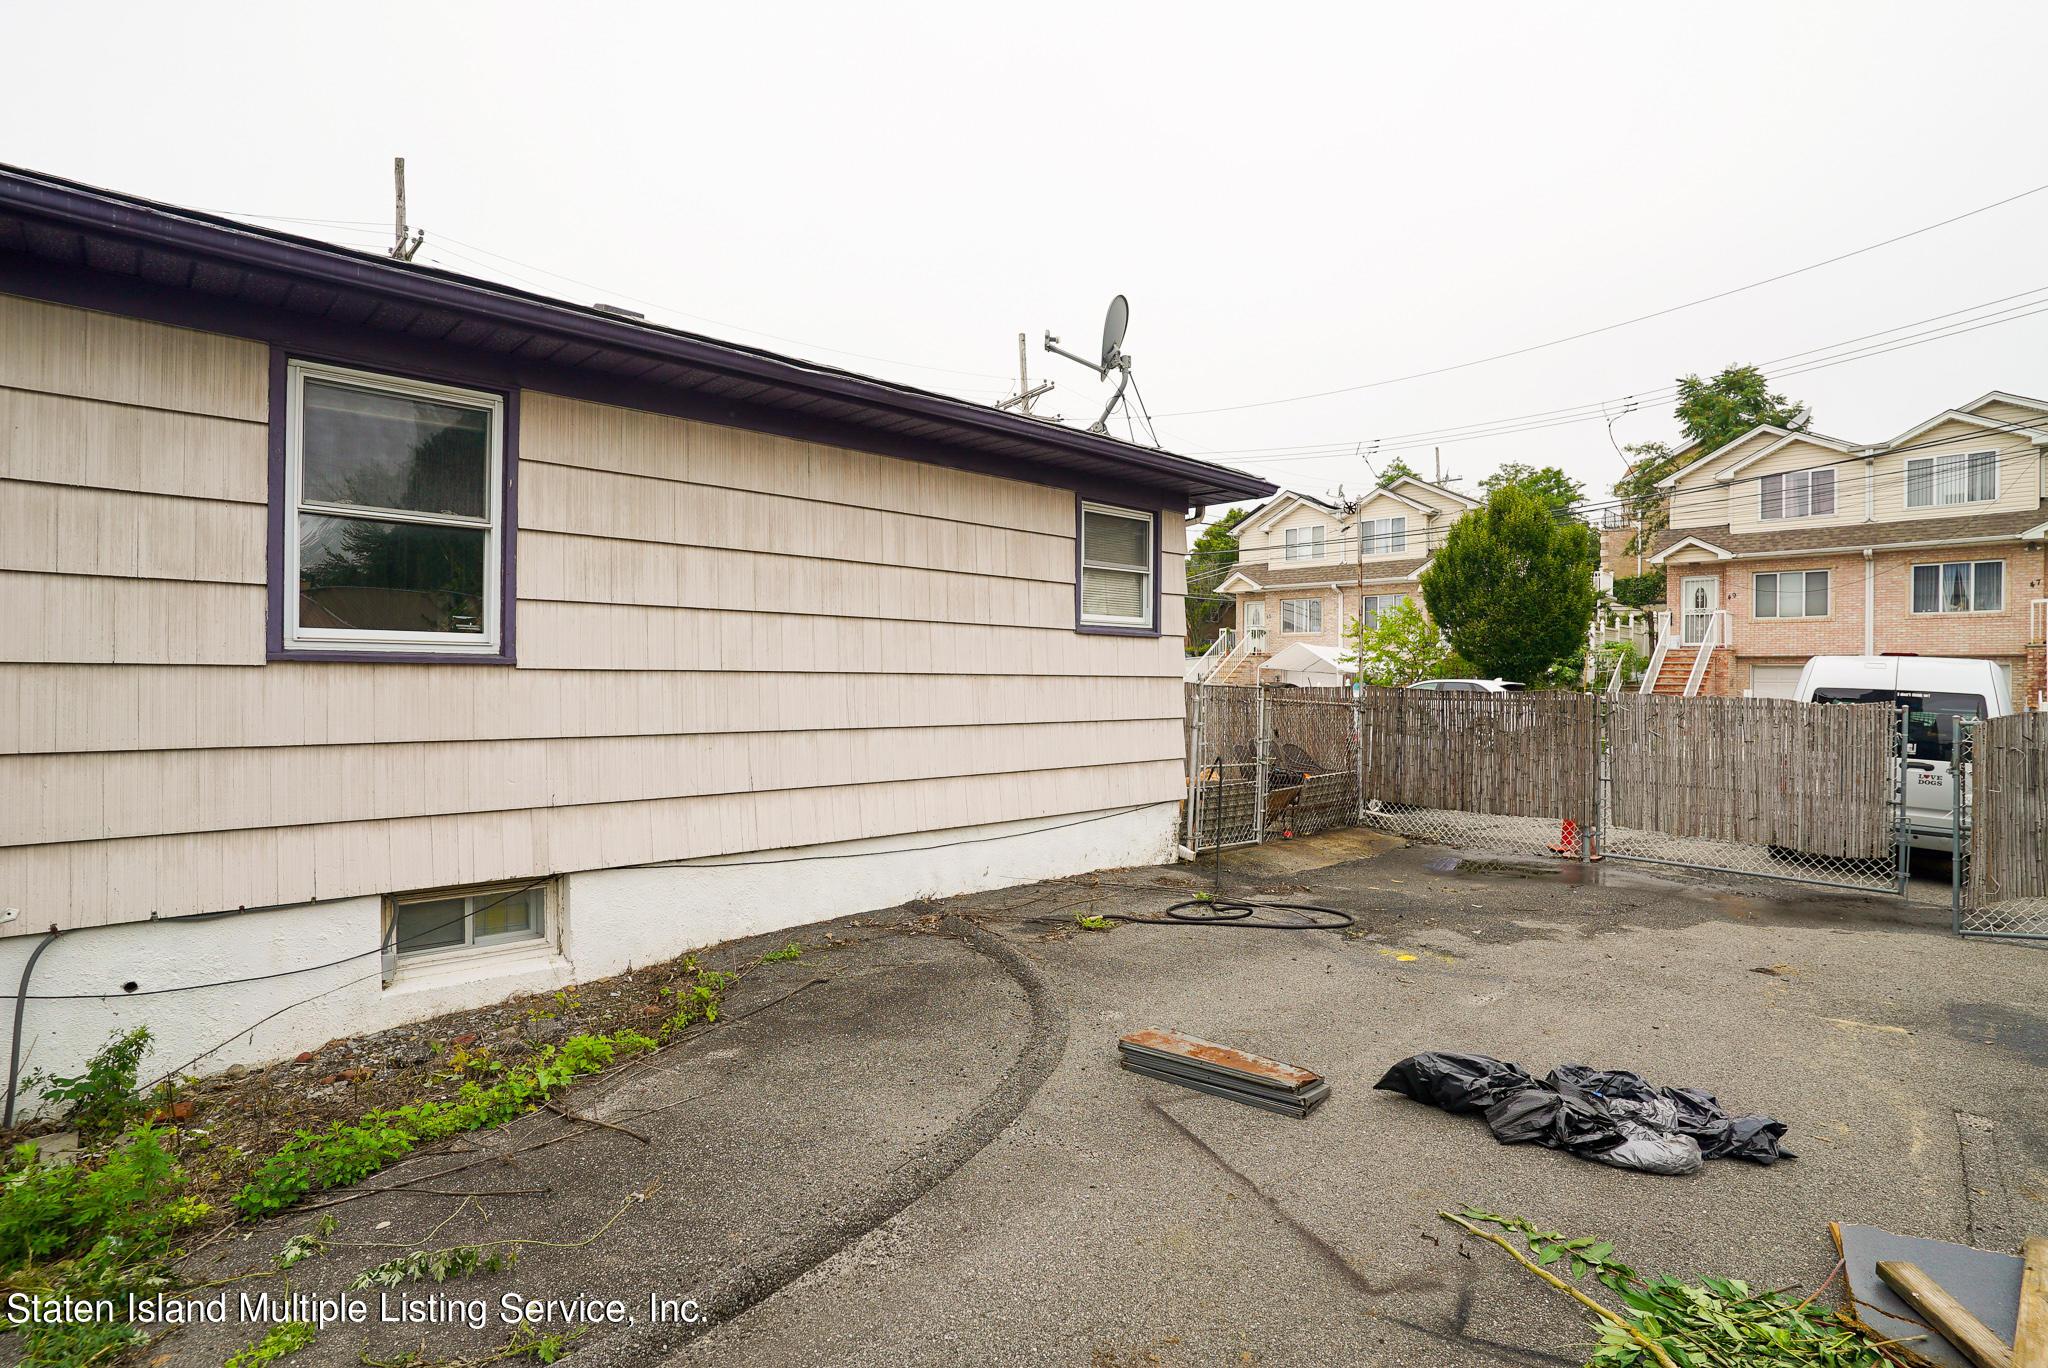 Single Family - Detached 121 Parkinson Avenue  Staten Island, NY 10305, MLS-1147747-29